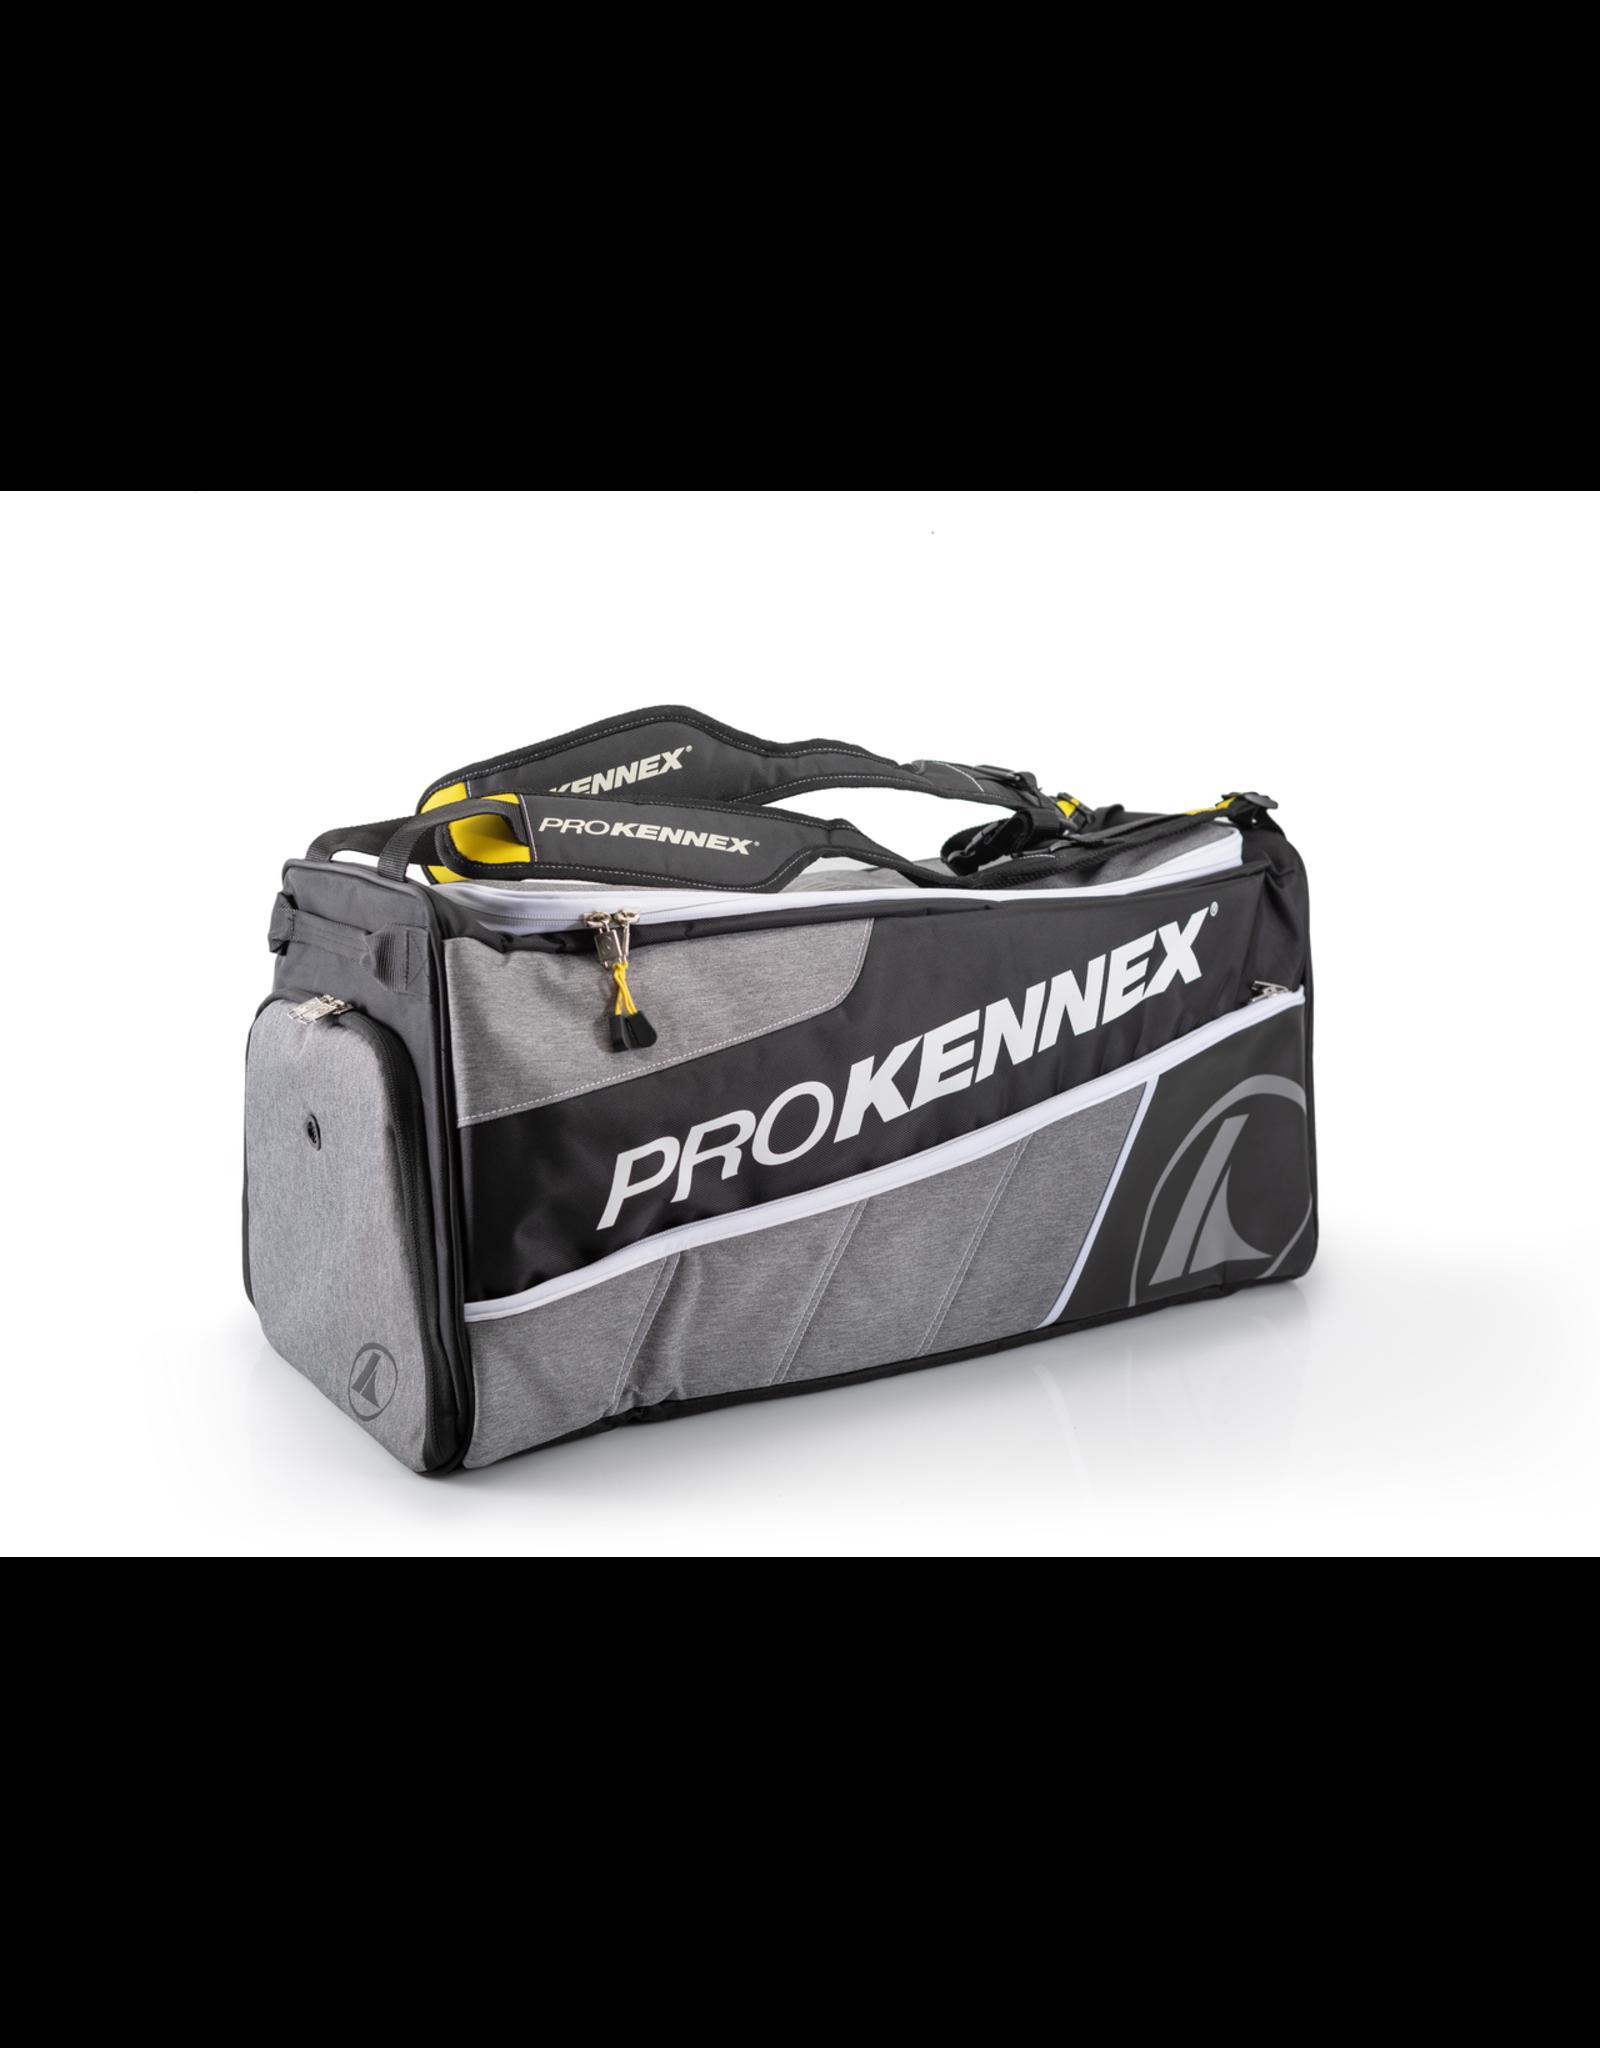 Pro Kennex QGear Pro Bag